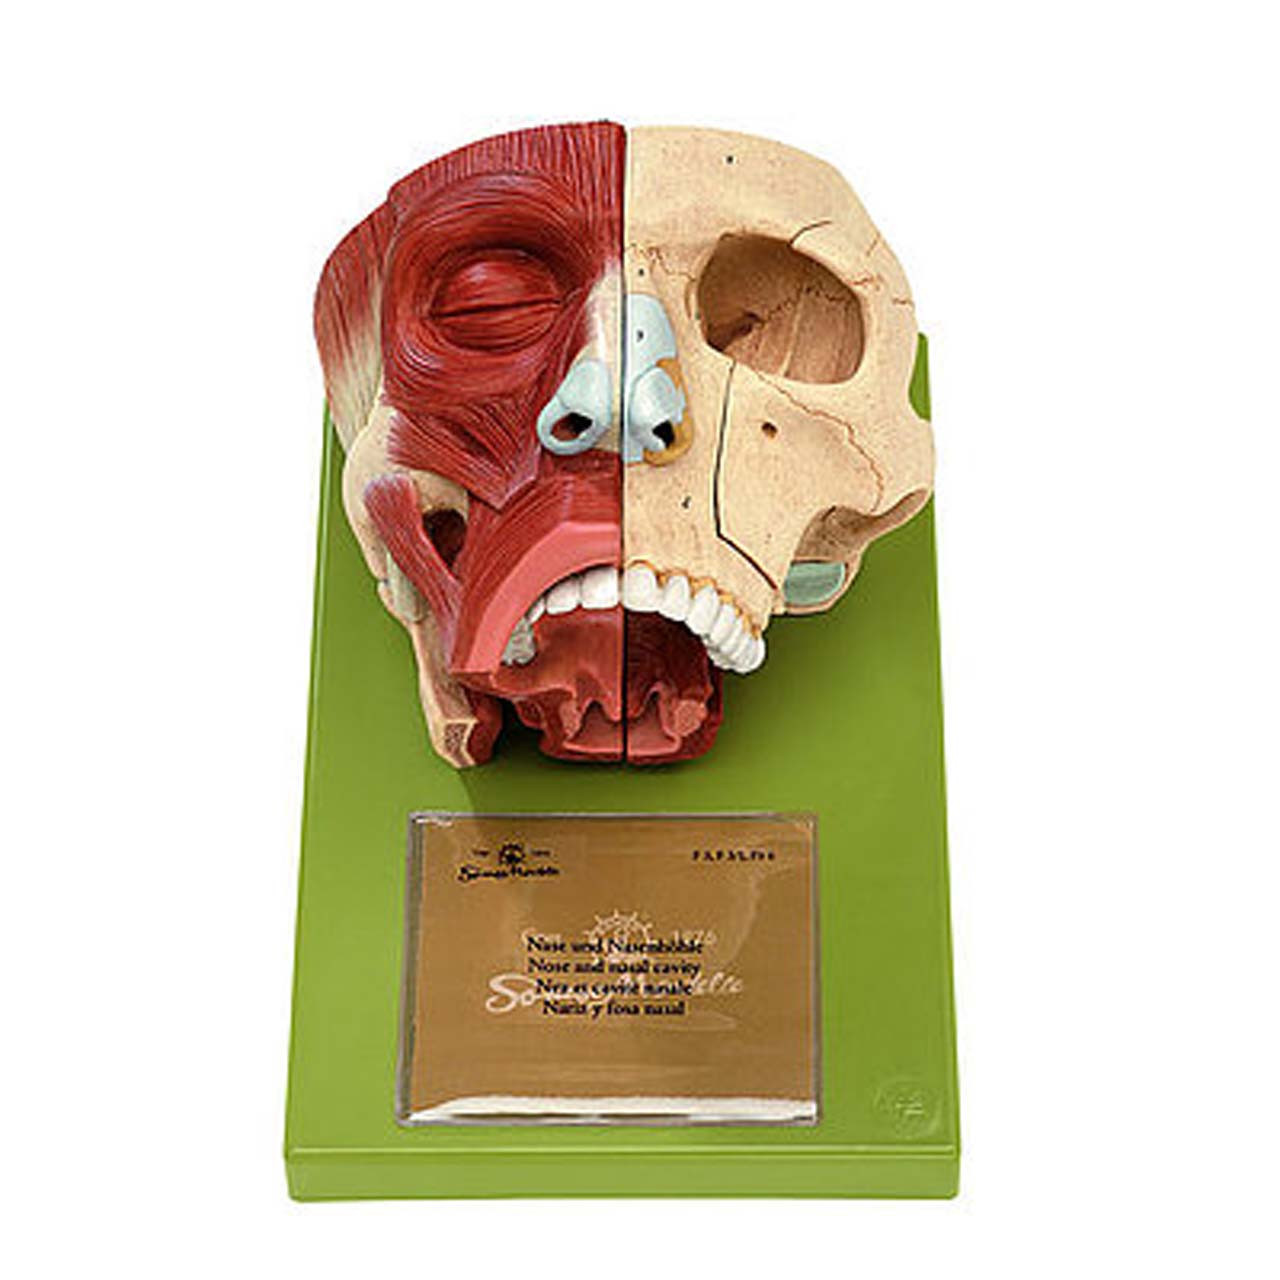 FS3 - Nose and Nasal Cavities